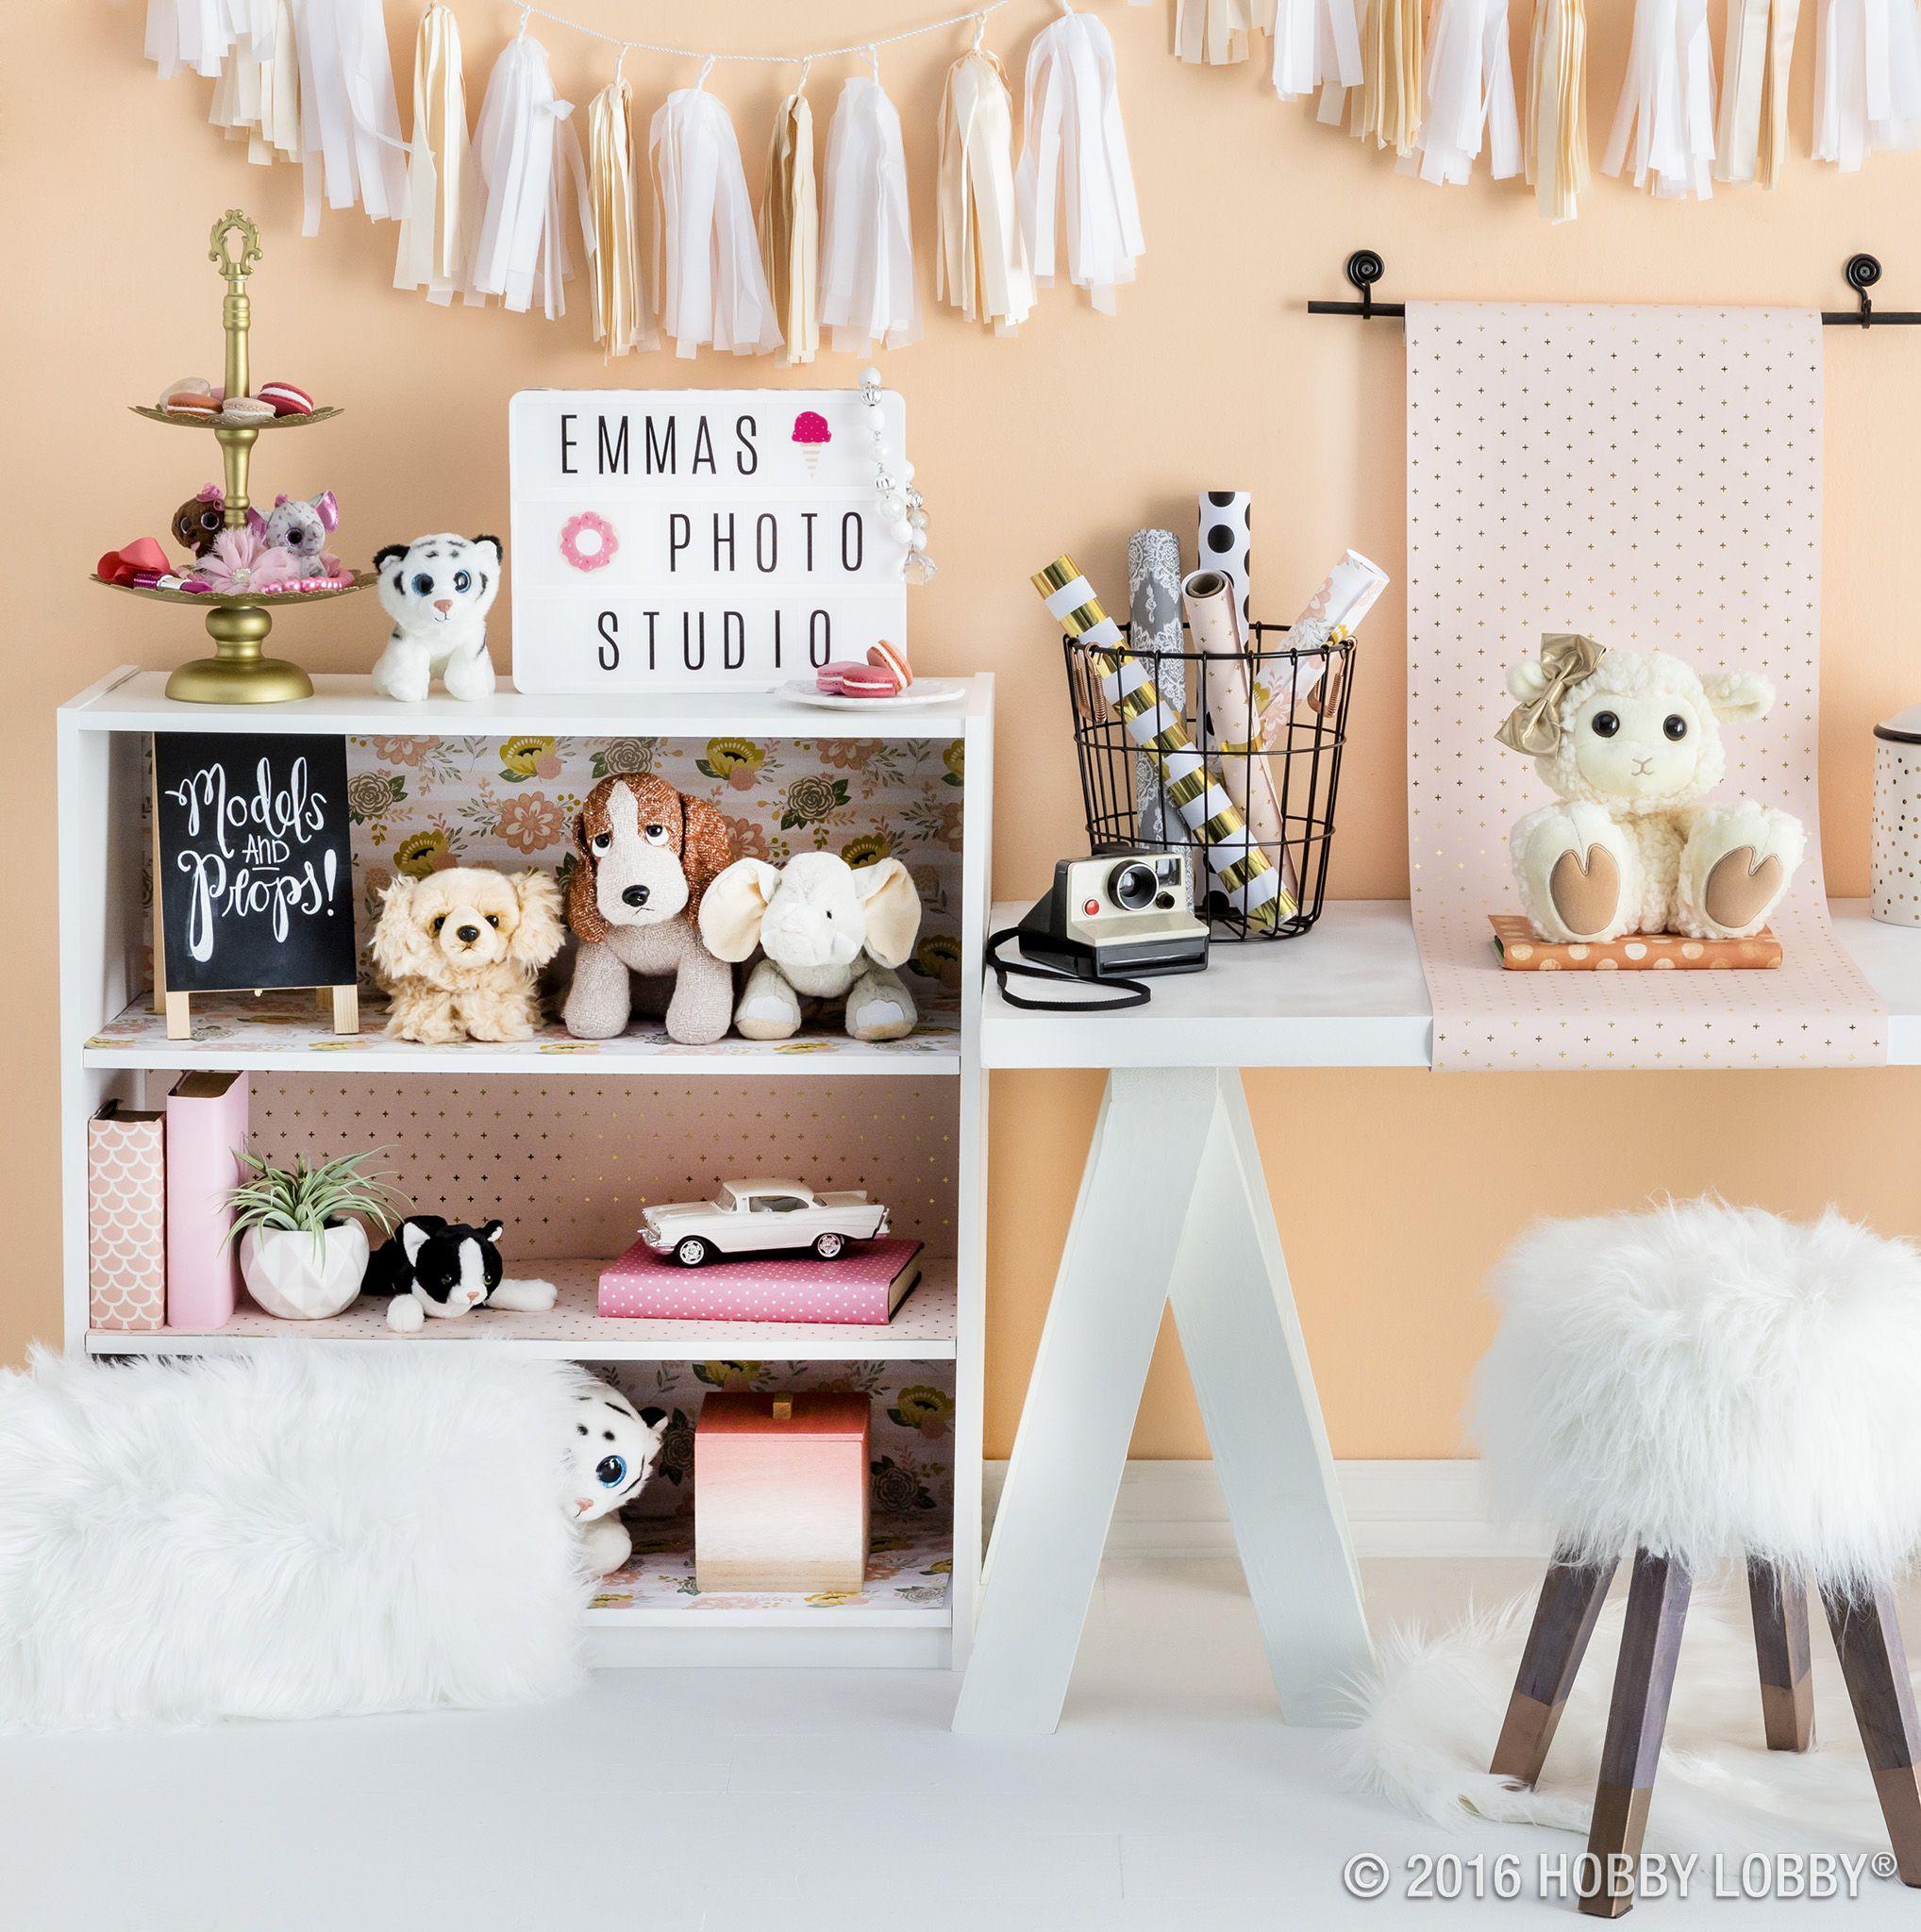 Create a cute photo op backdrop; line a boring bookshelf